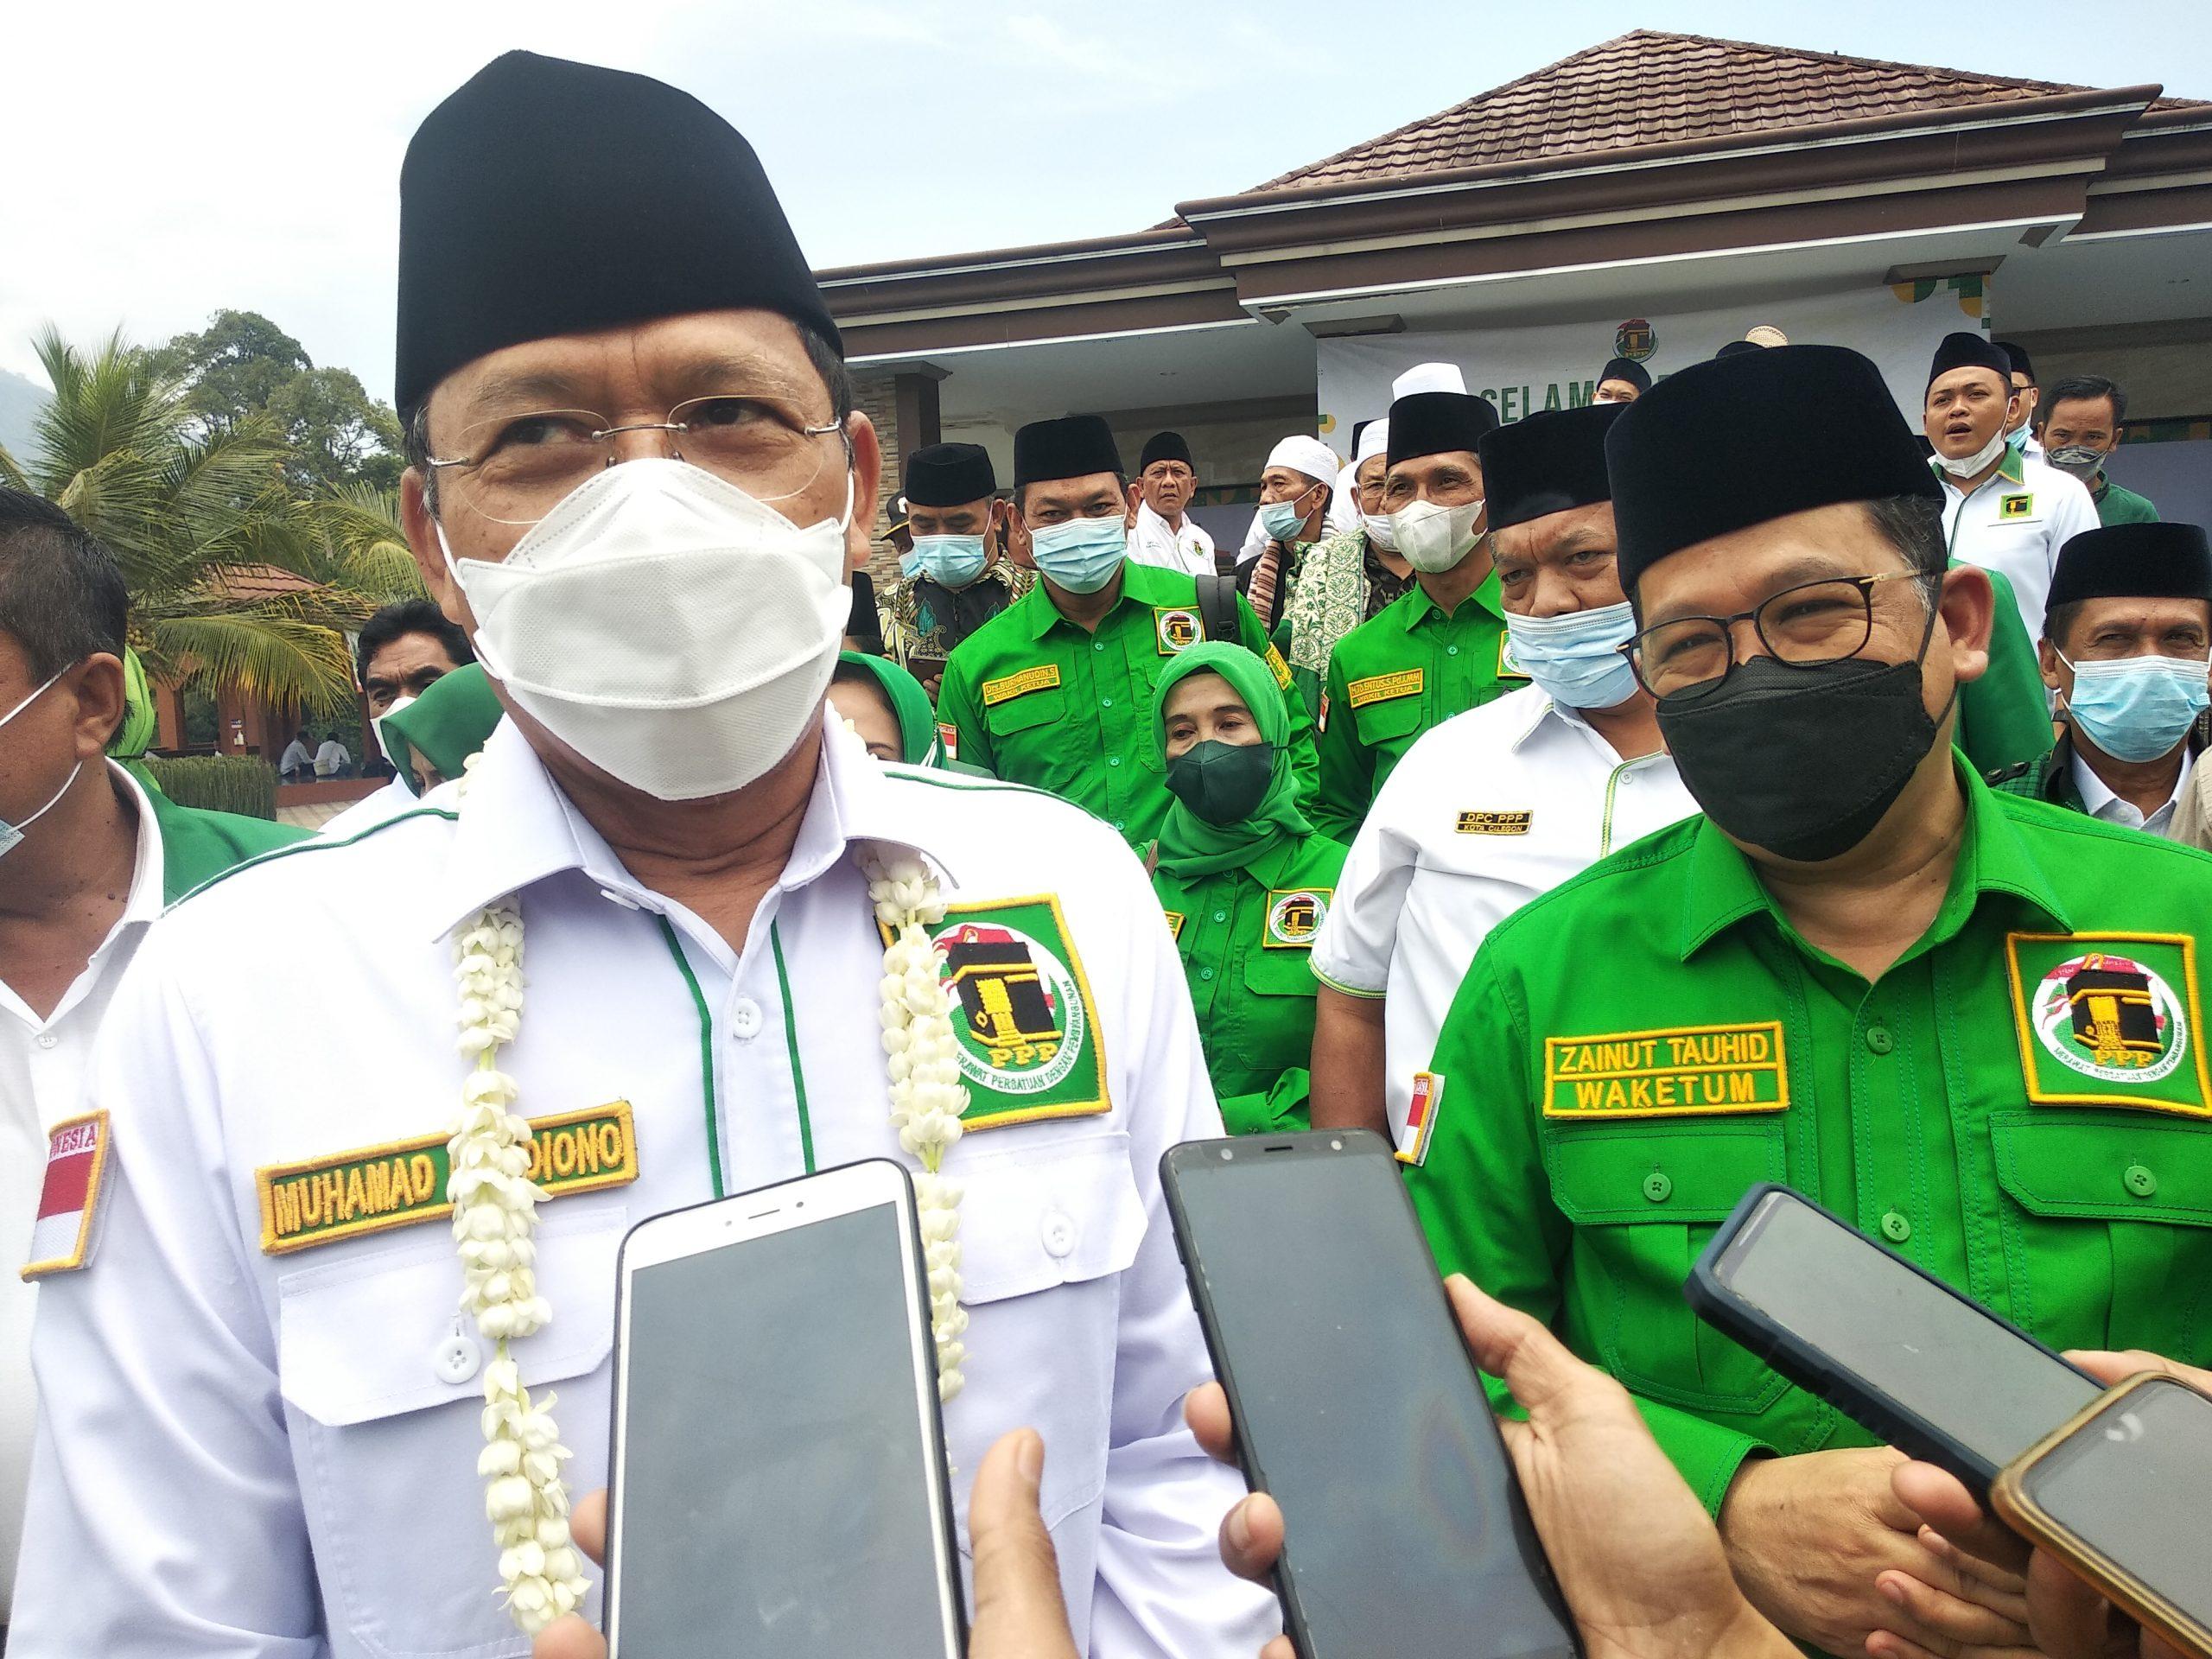 PPP Banten Susun Strategi, Siapkan Subadri Usuludin Maju di Pilgub 2024